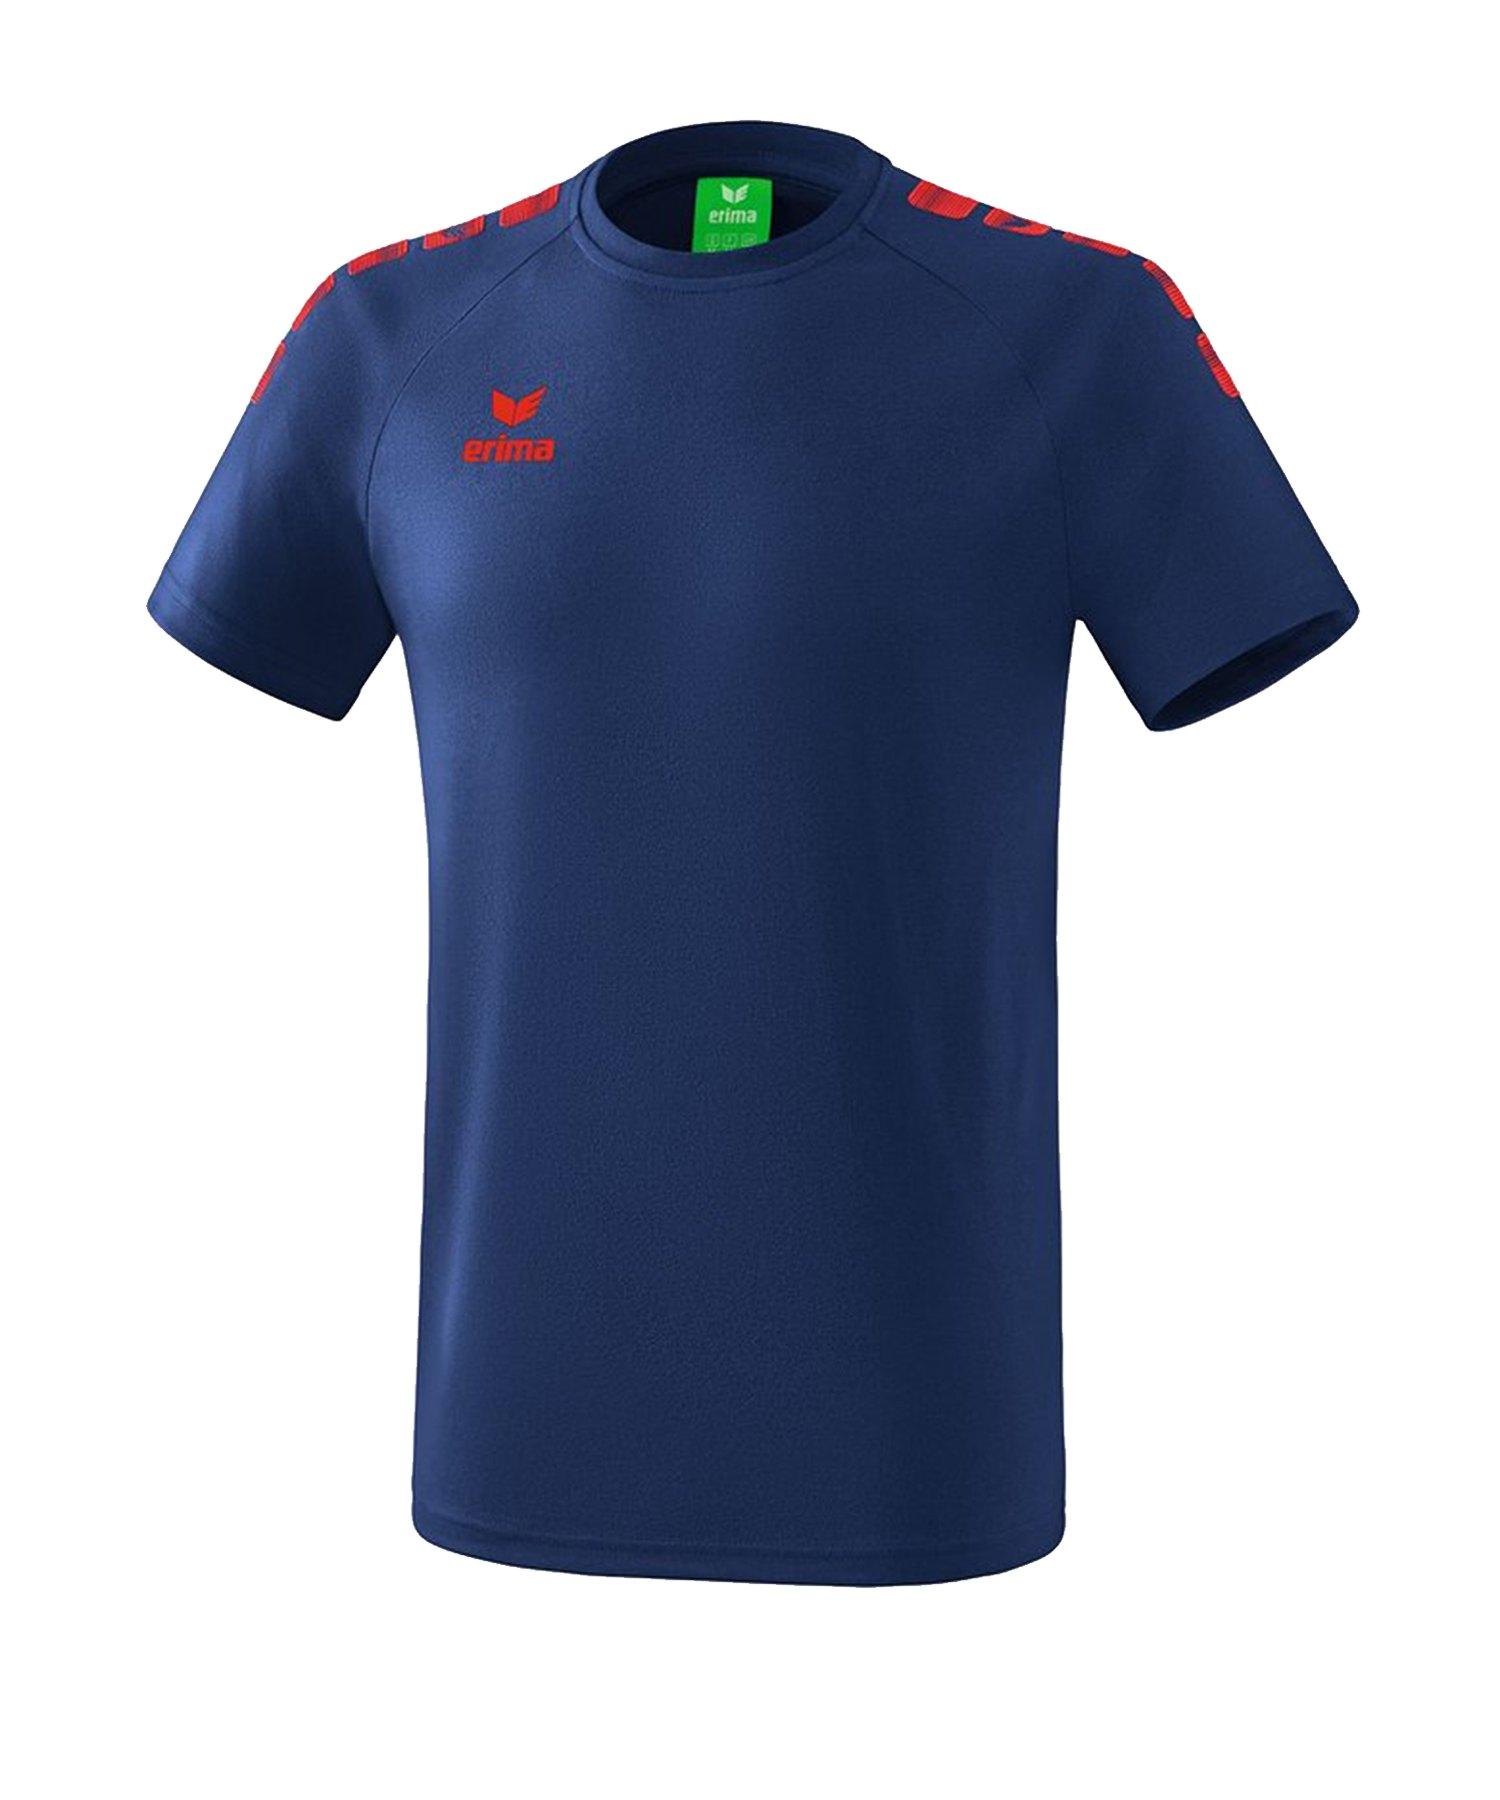 Erima Essential 5-C T-Shirt Kids Blau Rot - Blau